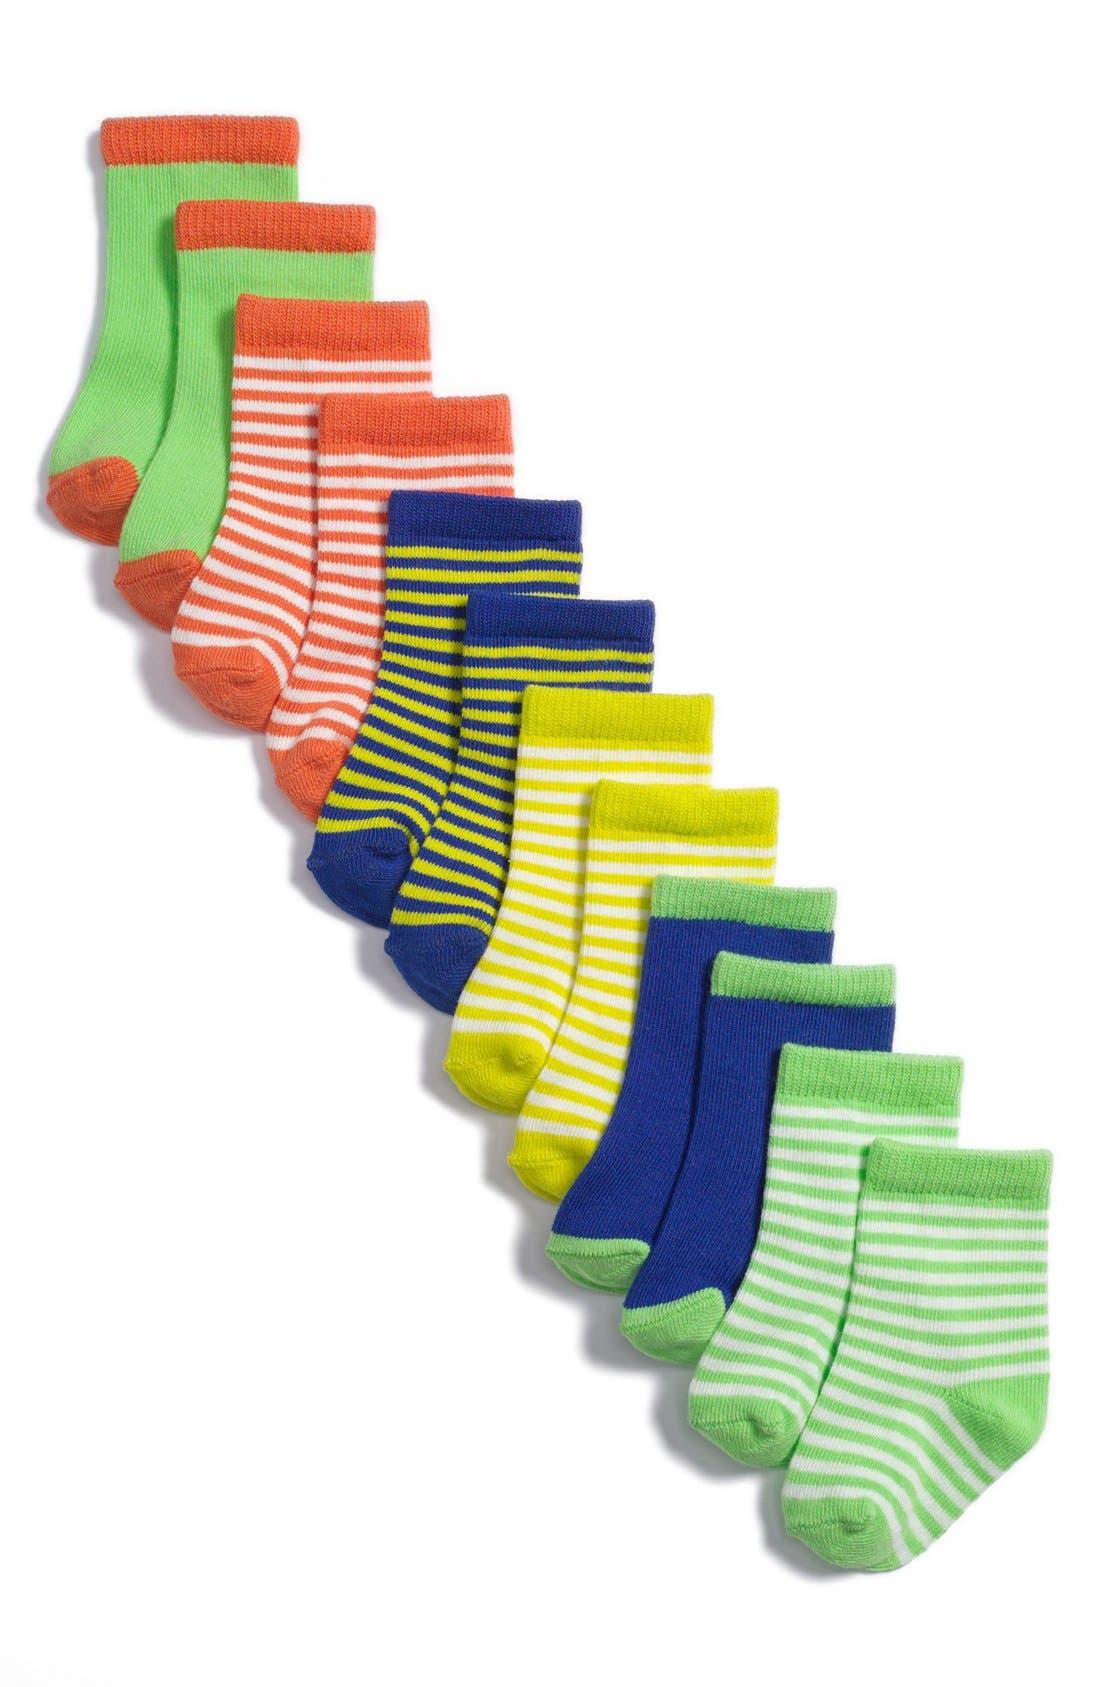 Alternate Image 1 Selected - Stem Baby Patterned Socks (6-Pack) (Baby Boys)